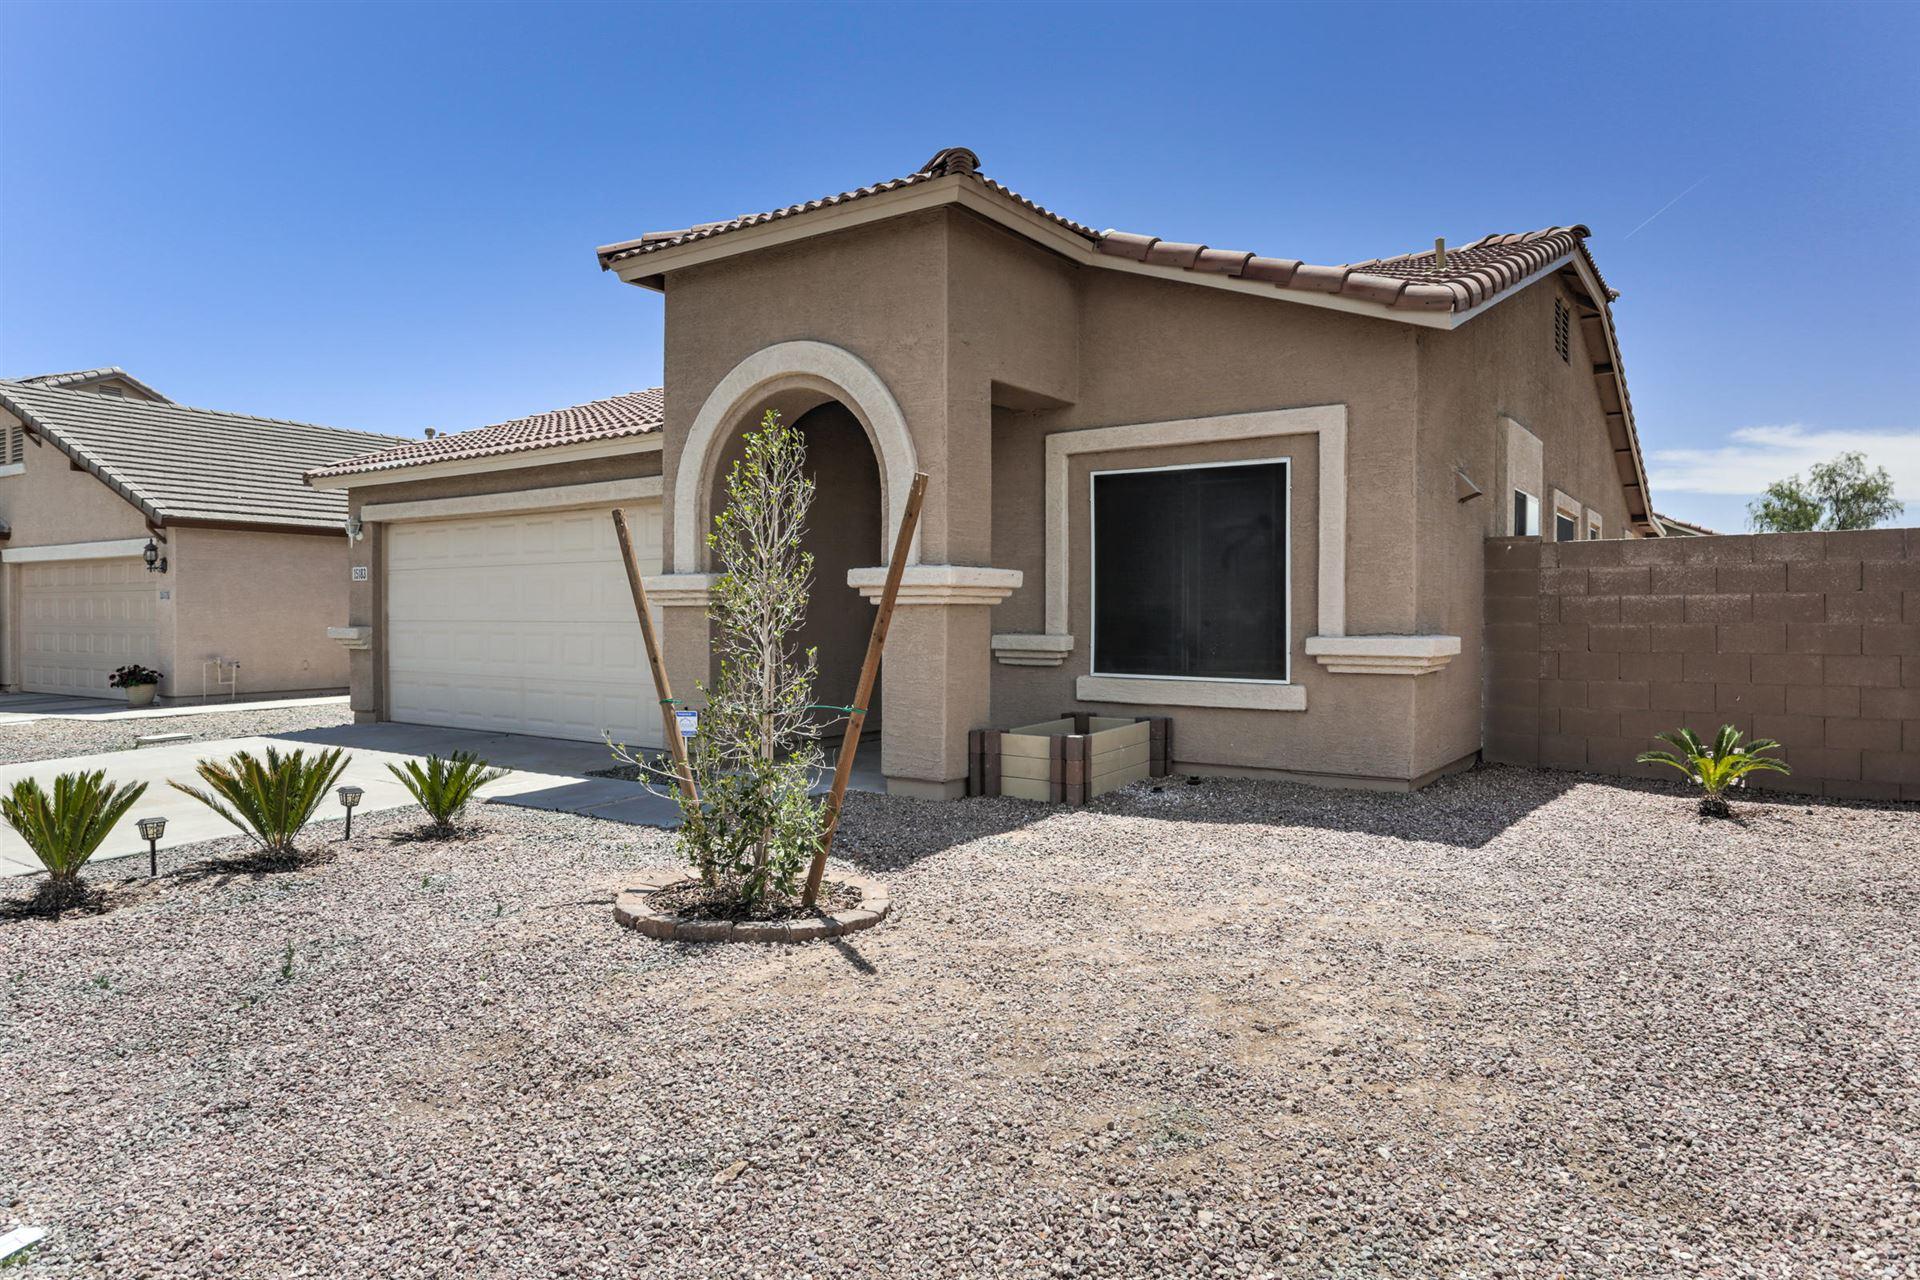 Photo of 15183 W LINCOLN Street, Goodyear, AZ 85338 (MLS # 6232450)